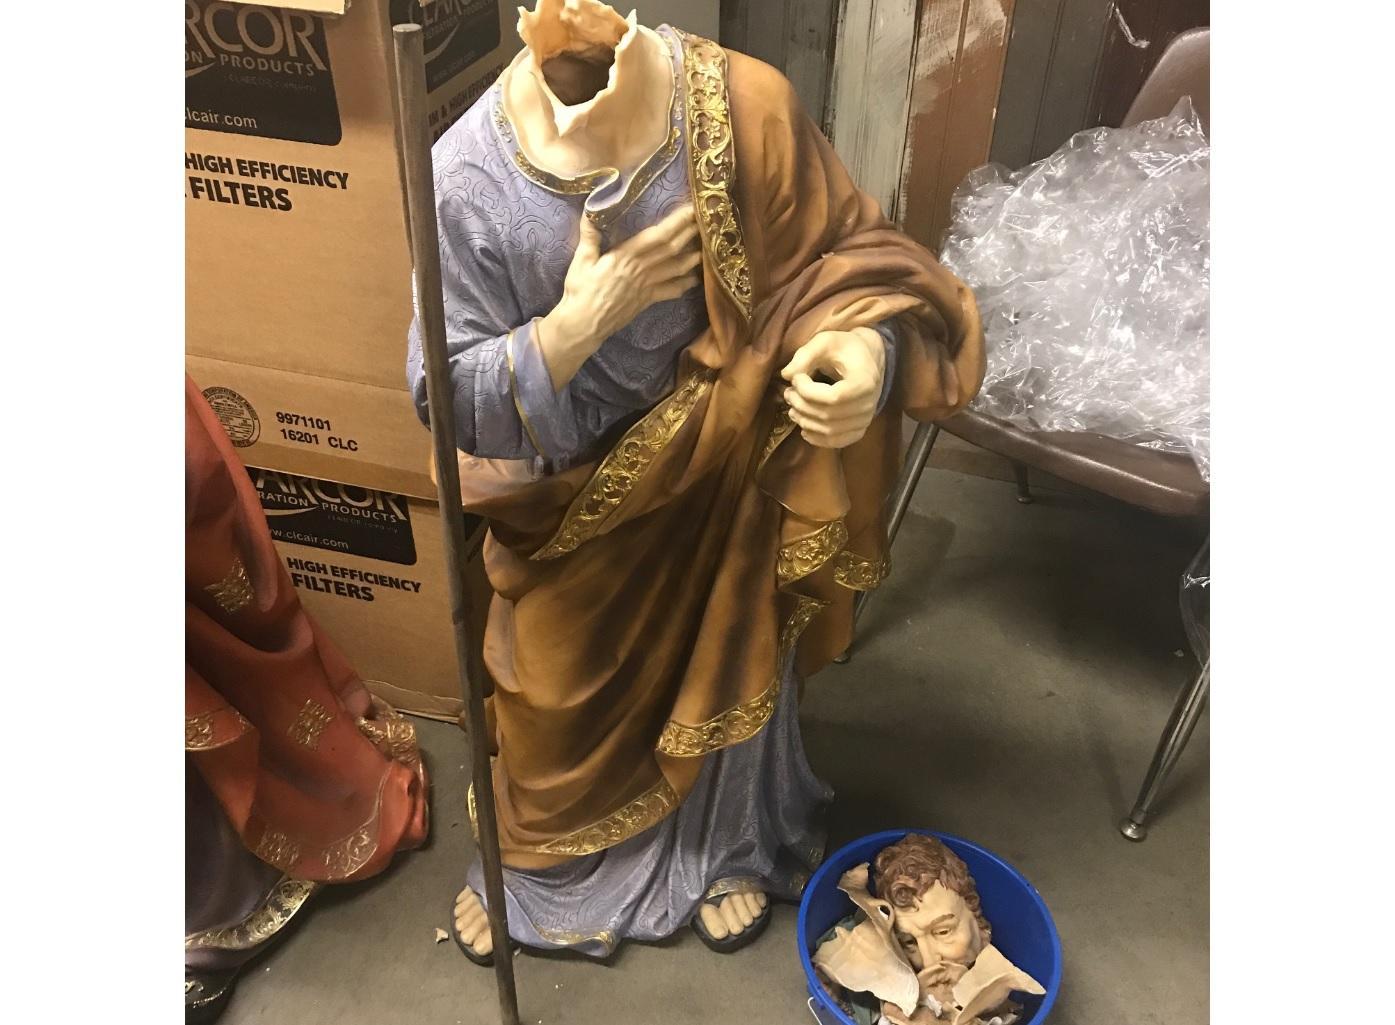 "<div class=""meta image-caption""><div class=""origin-logo origin-image none""><span>none</span></div><span class=""caption-text"">Basement broken into, nativity scene statues broken. (Photos provided by: Fresno attorney Michael Berdinella)</span></div>"